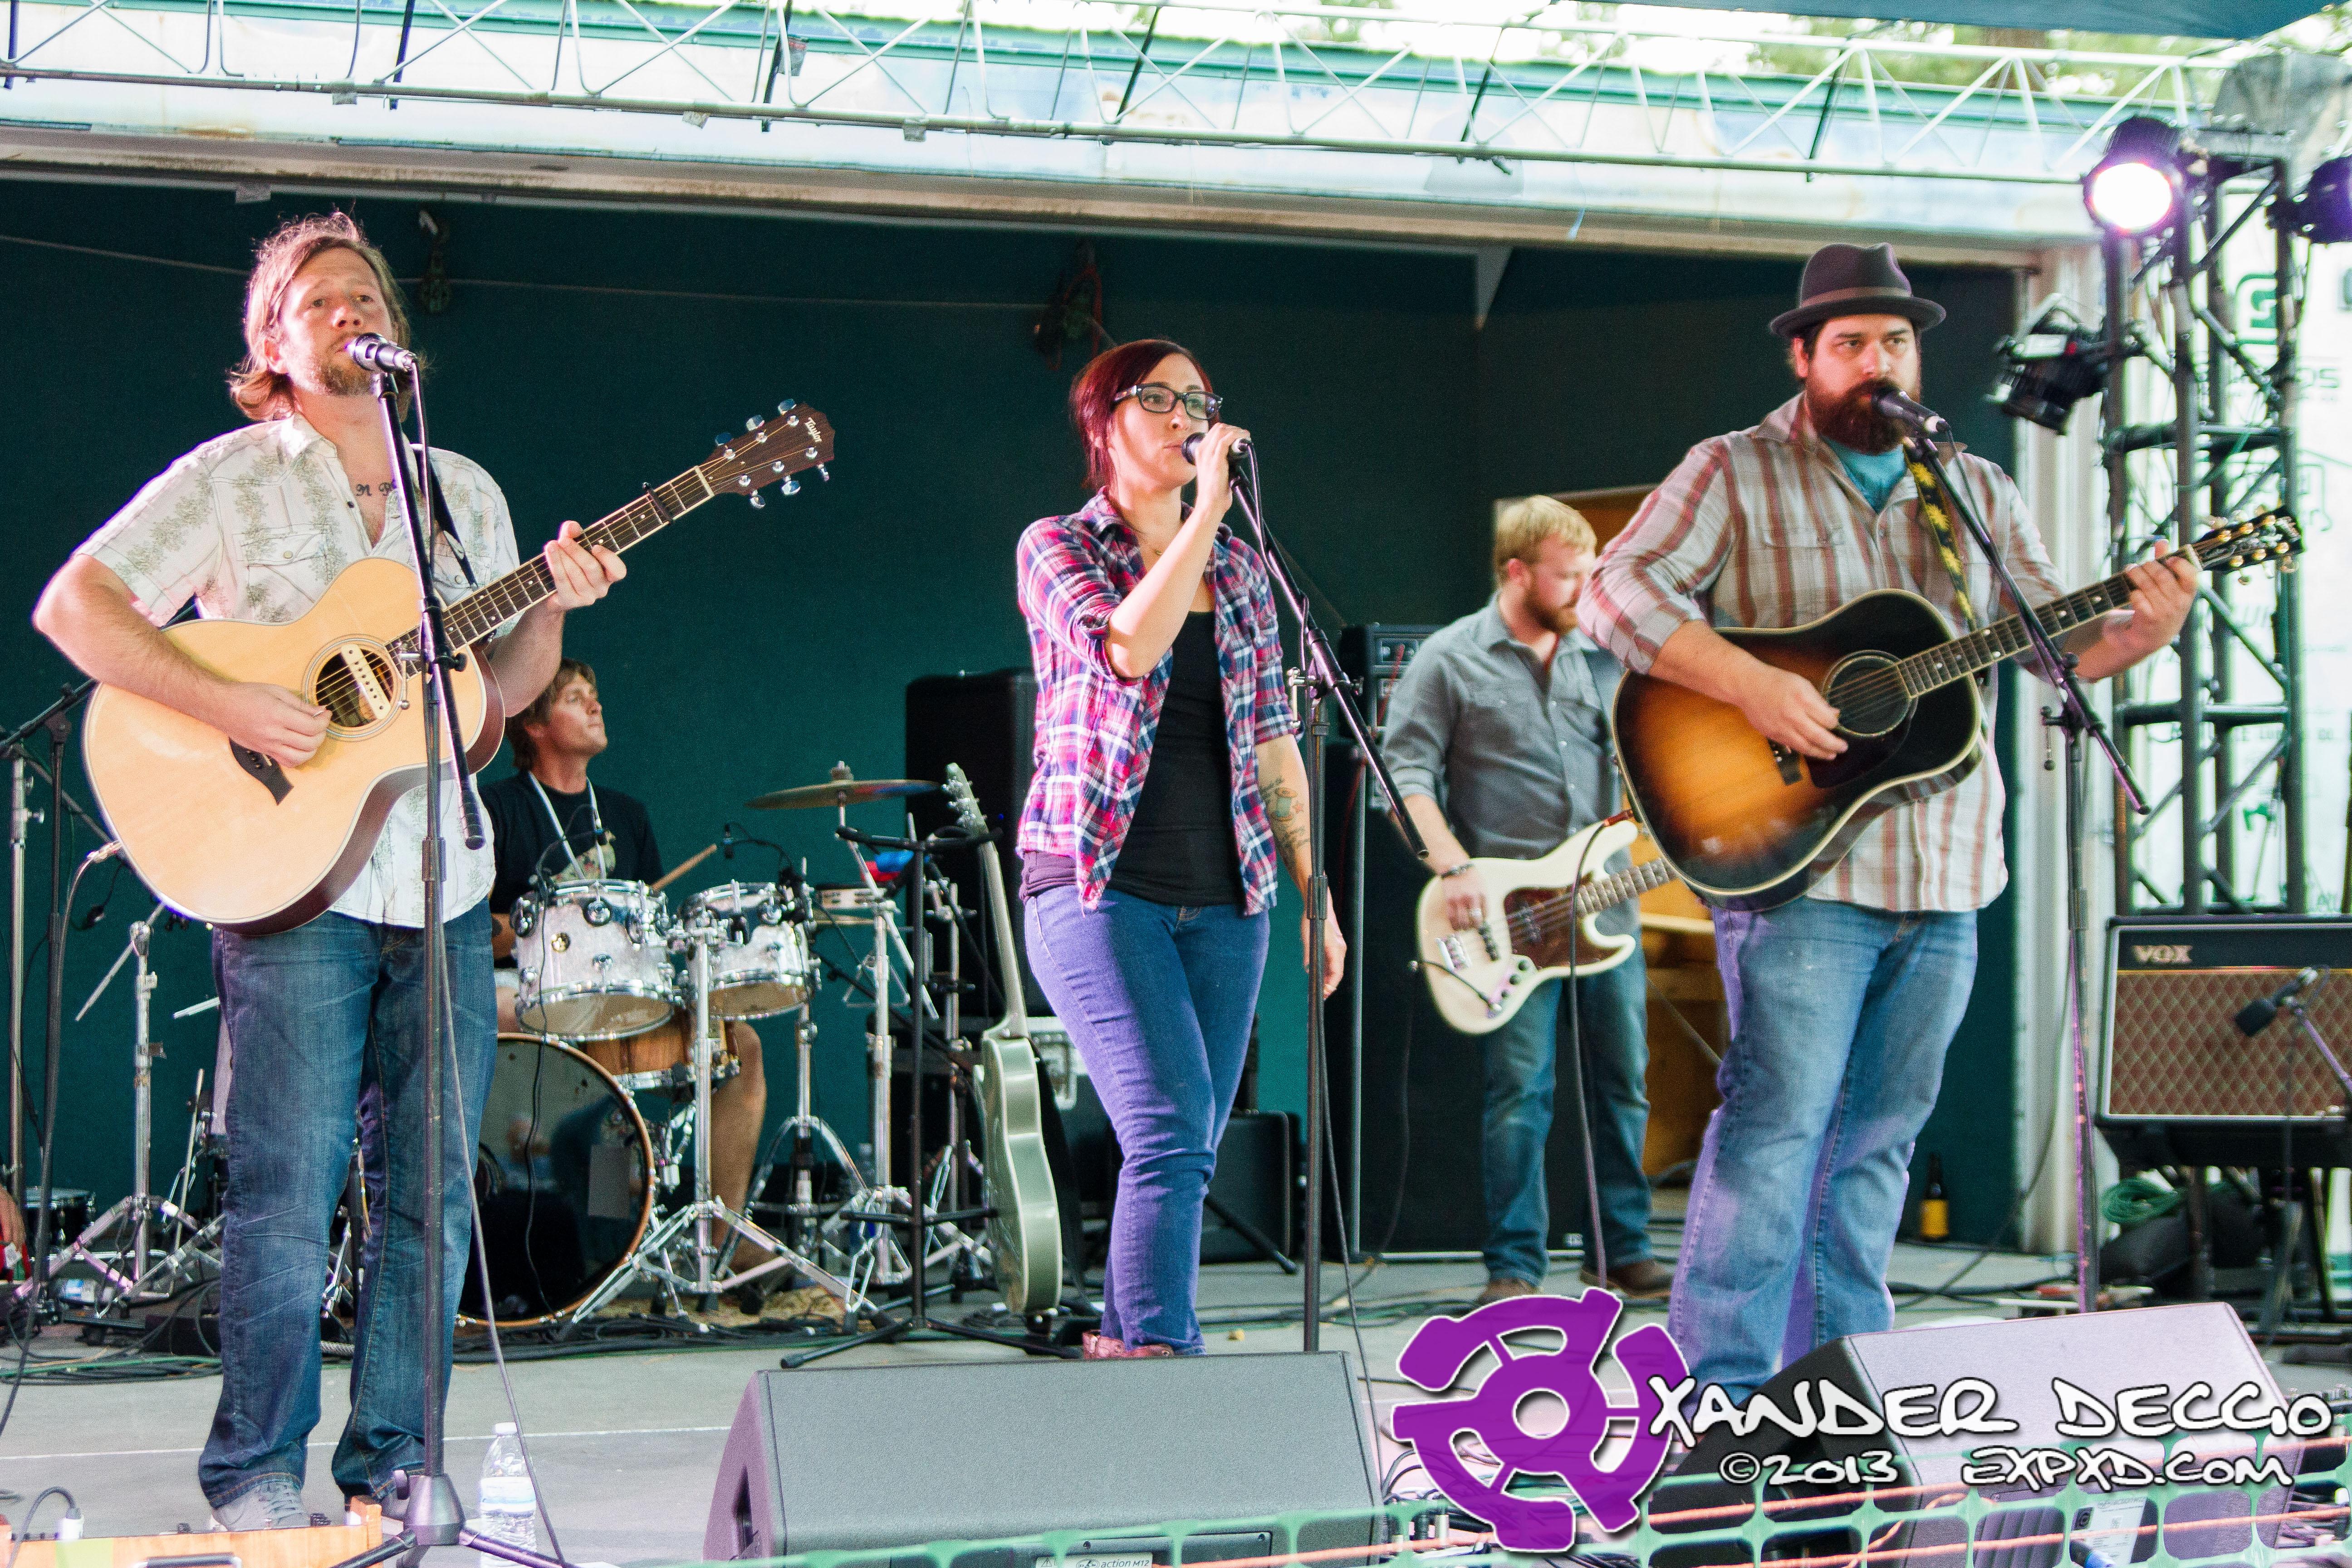 Chinook Fest 2013 Day 1 (Photo by Xander Deccio)